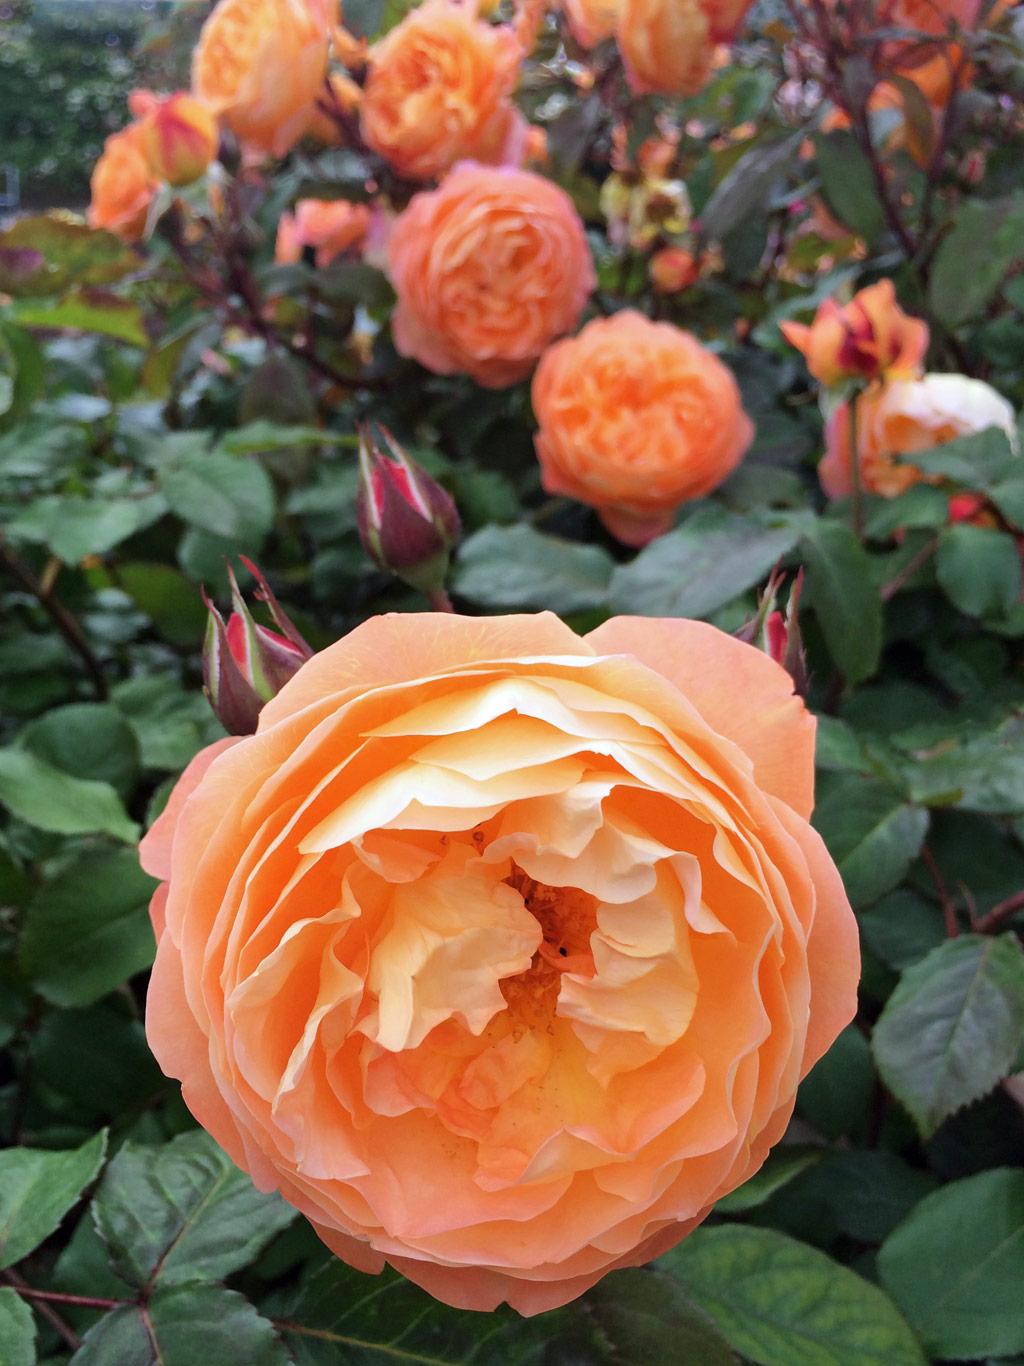 rose - photo #16